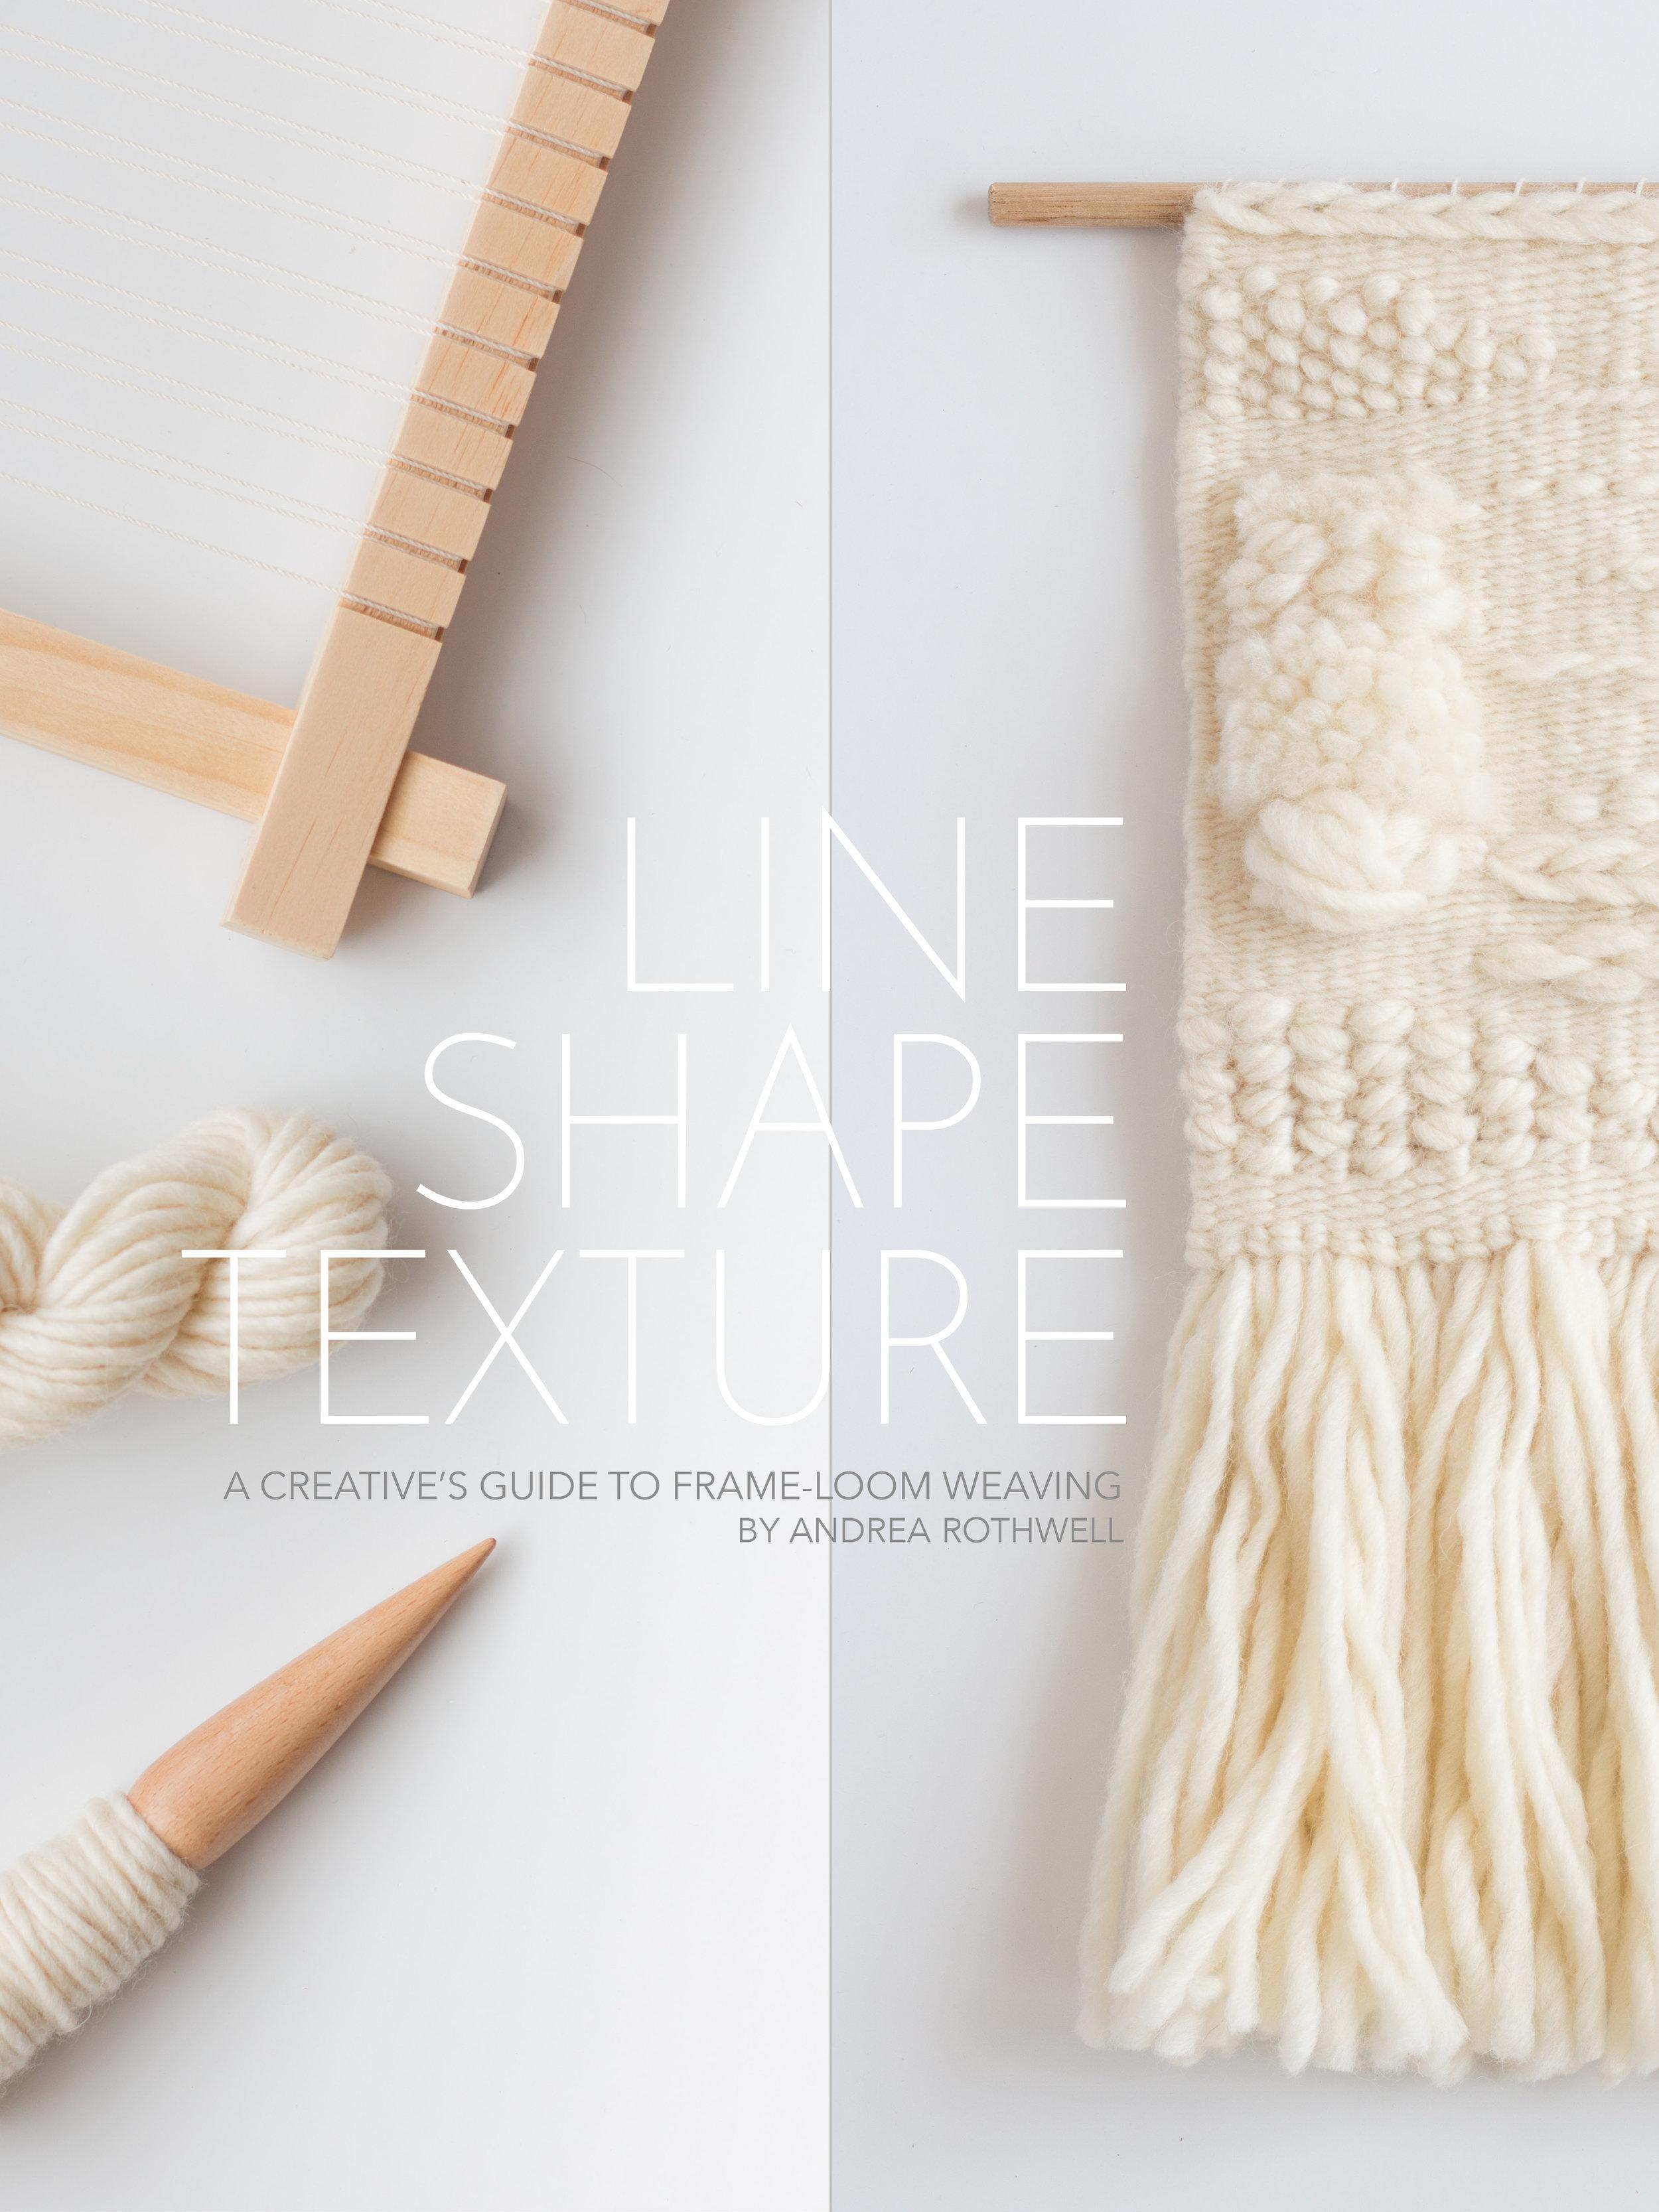 LINE SHAPE TEXTURE A Creative's Guide to Frame-Loom Weaving.jpg